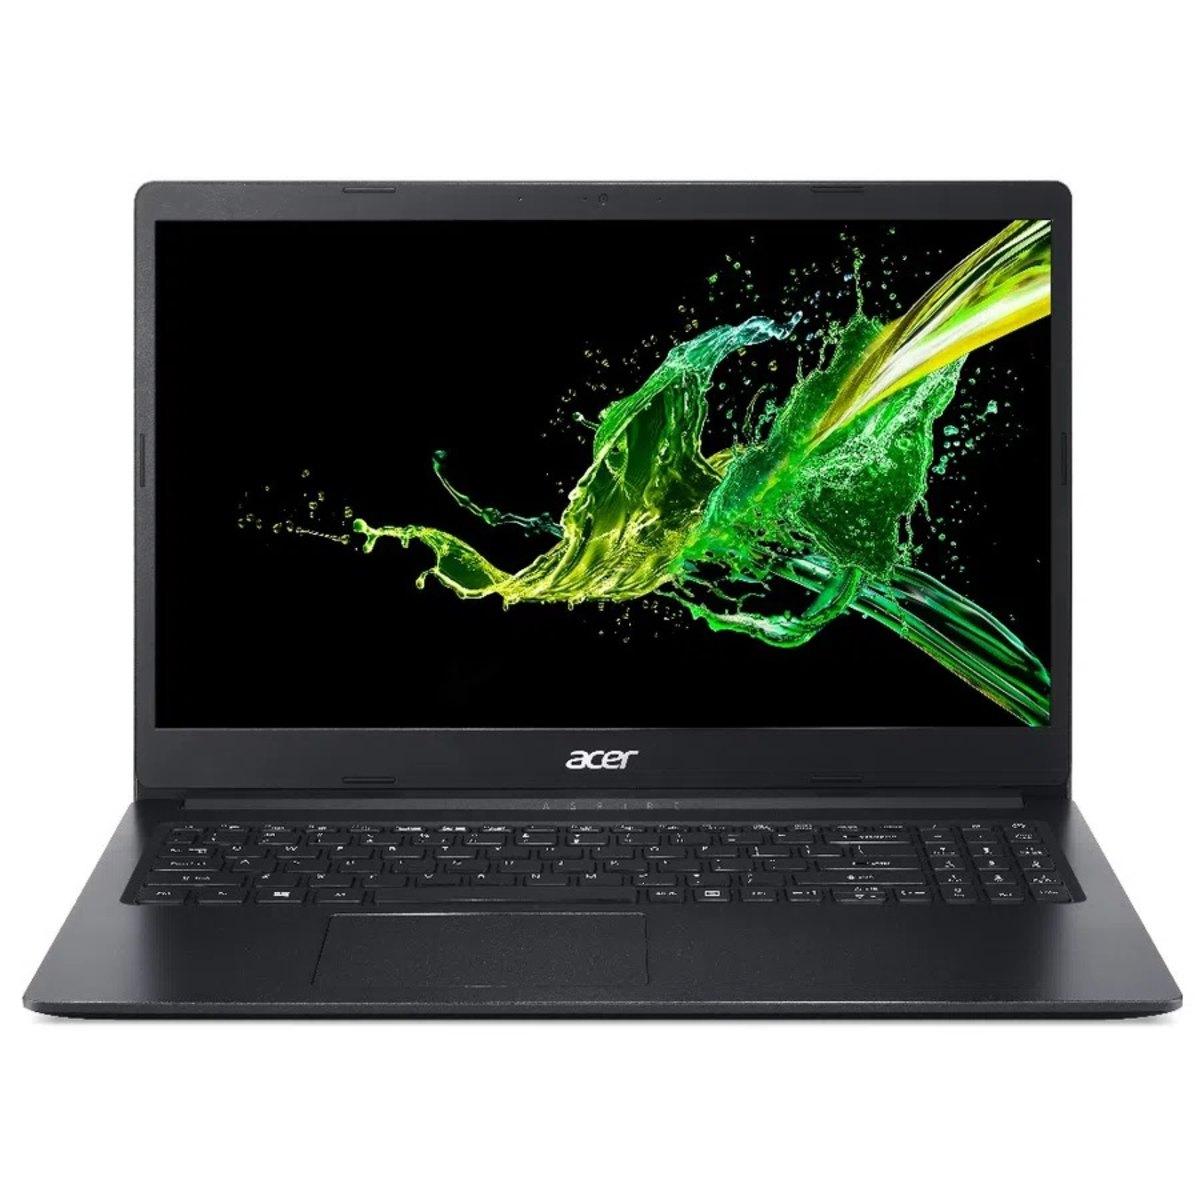 Notebook Acer A315 Intel Celeron N4000 Memoria 4gb Hd 1tb Tela 15.6' Hd Endless Os